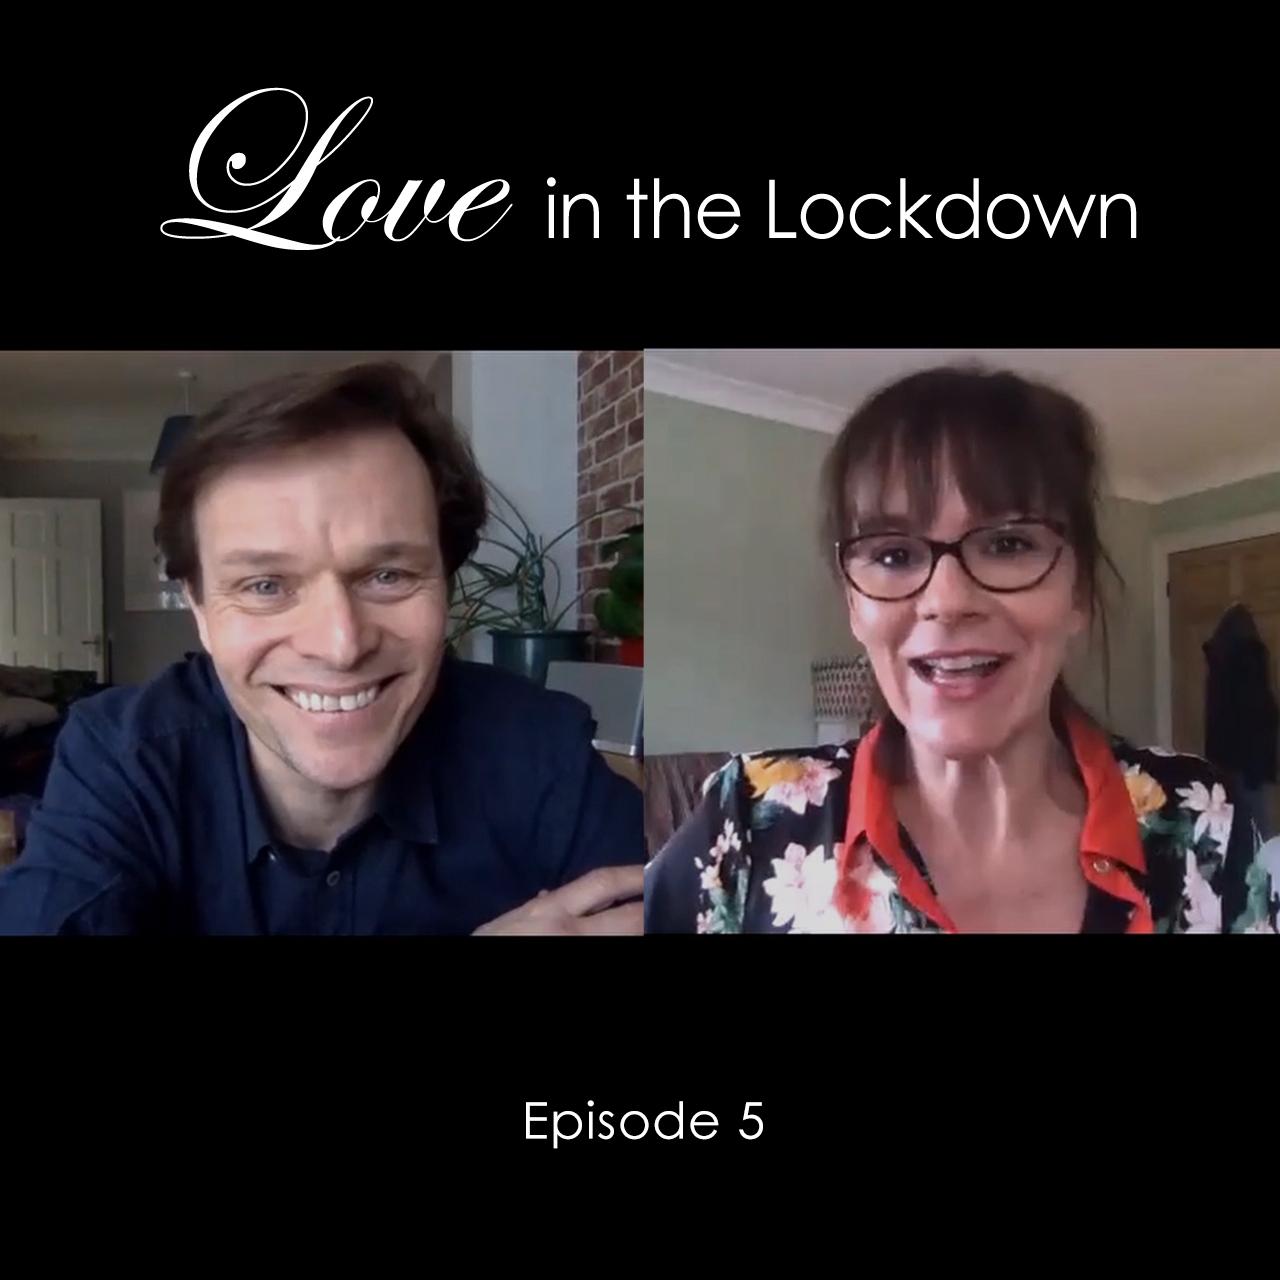 Love in the Lockdown Episode 5 Thumbnail